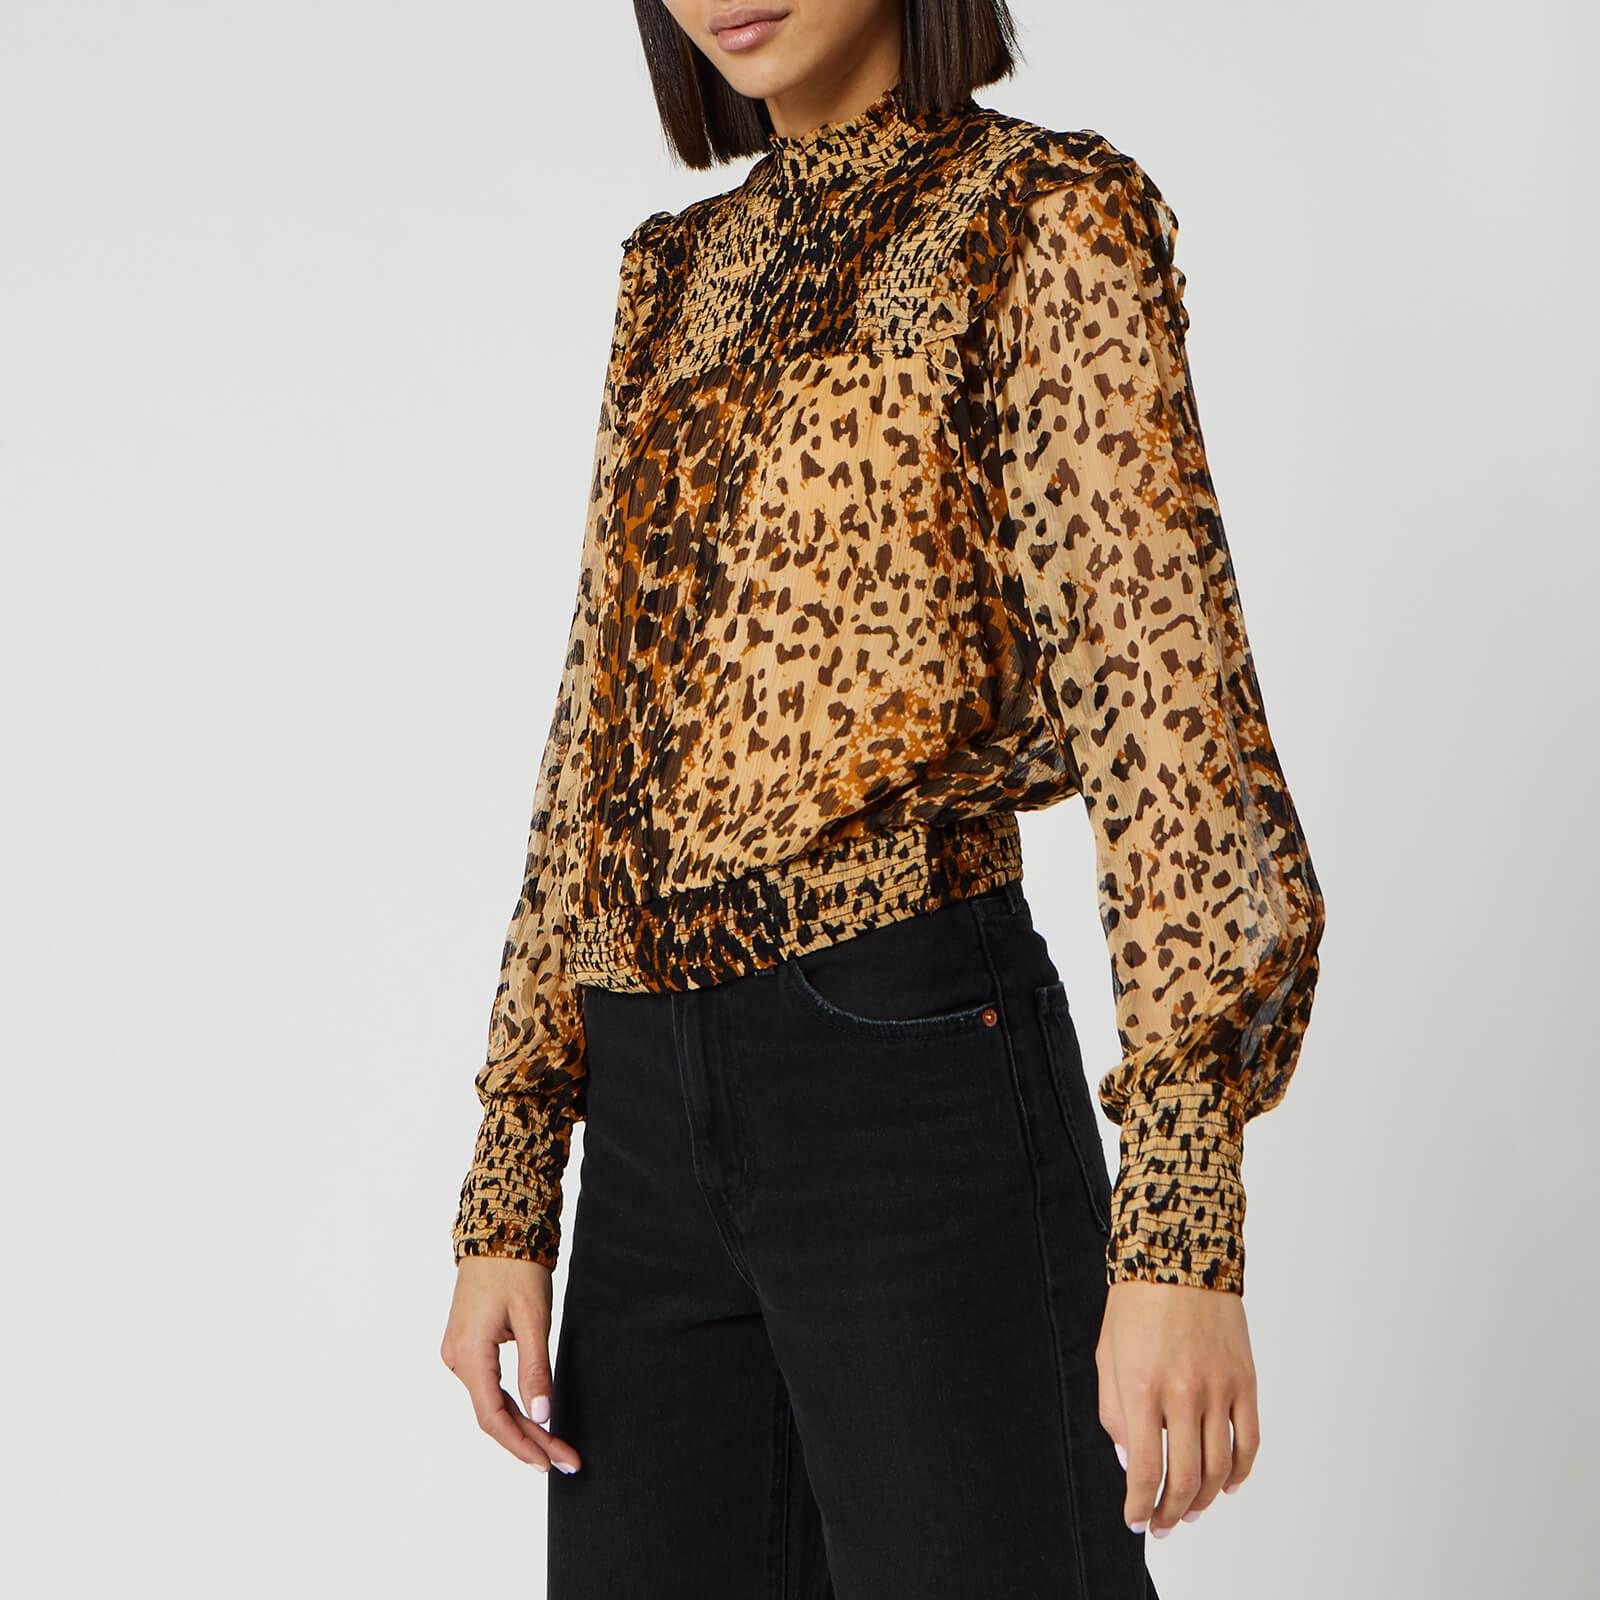 Free People Women's Roma Blouse - Brown Leopard - XS